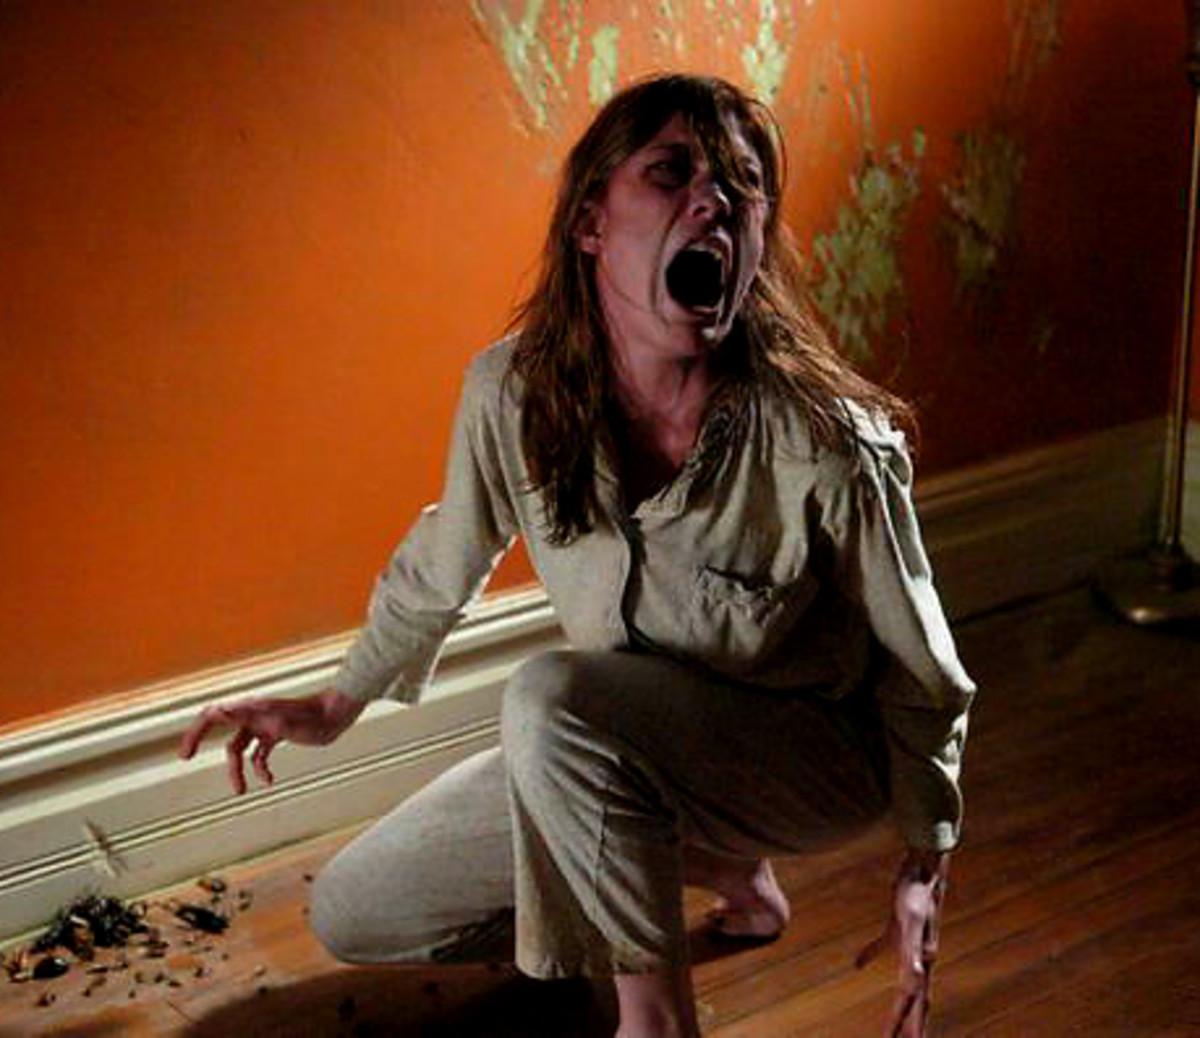 The Exorcism of Emily Rose